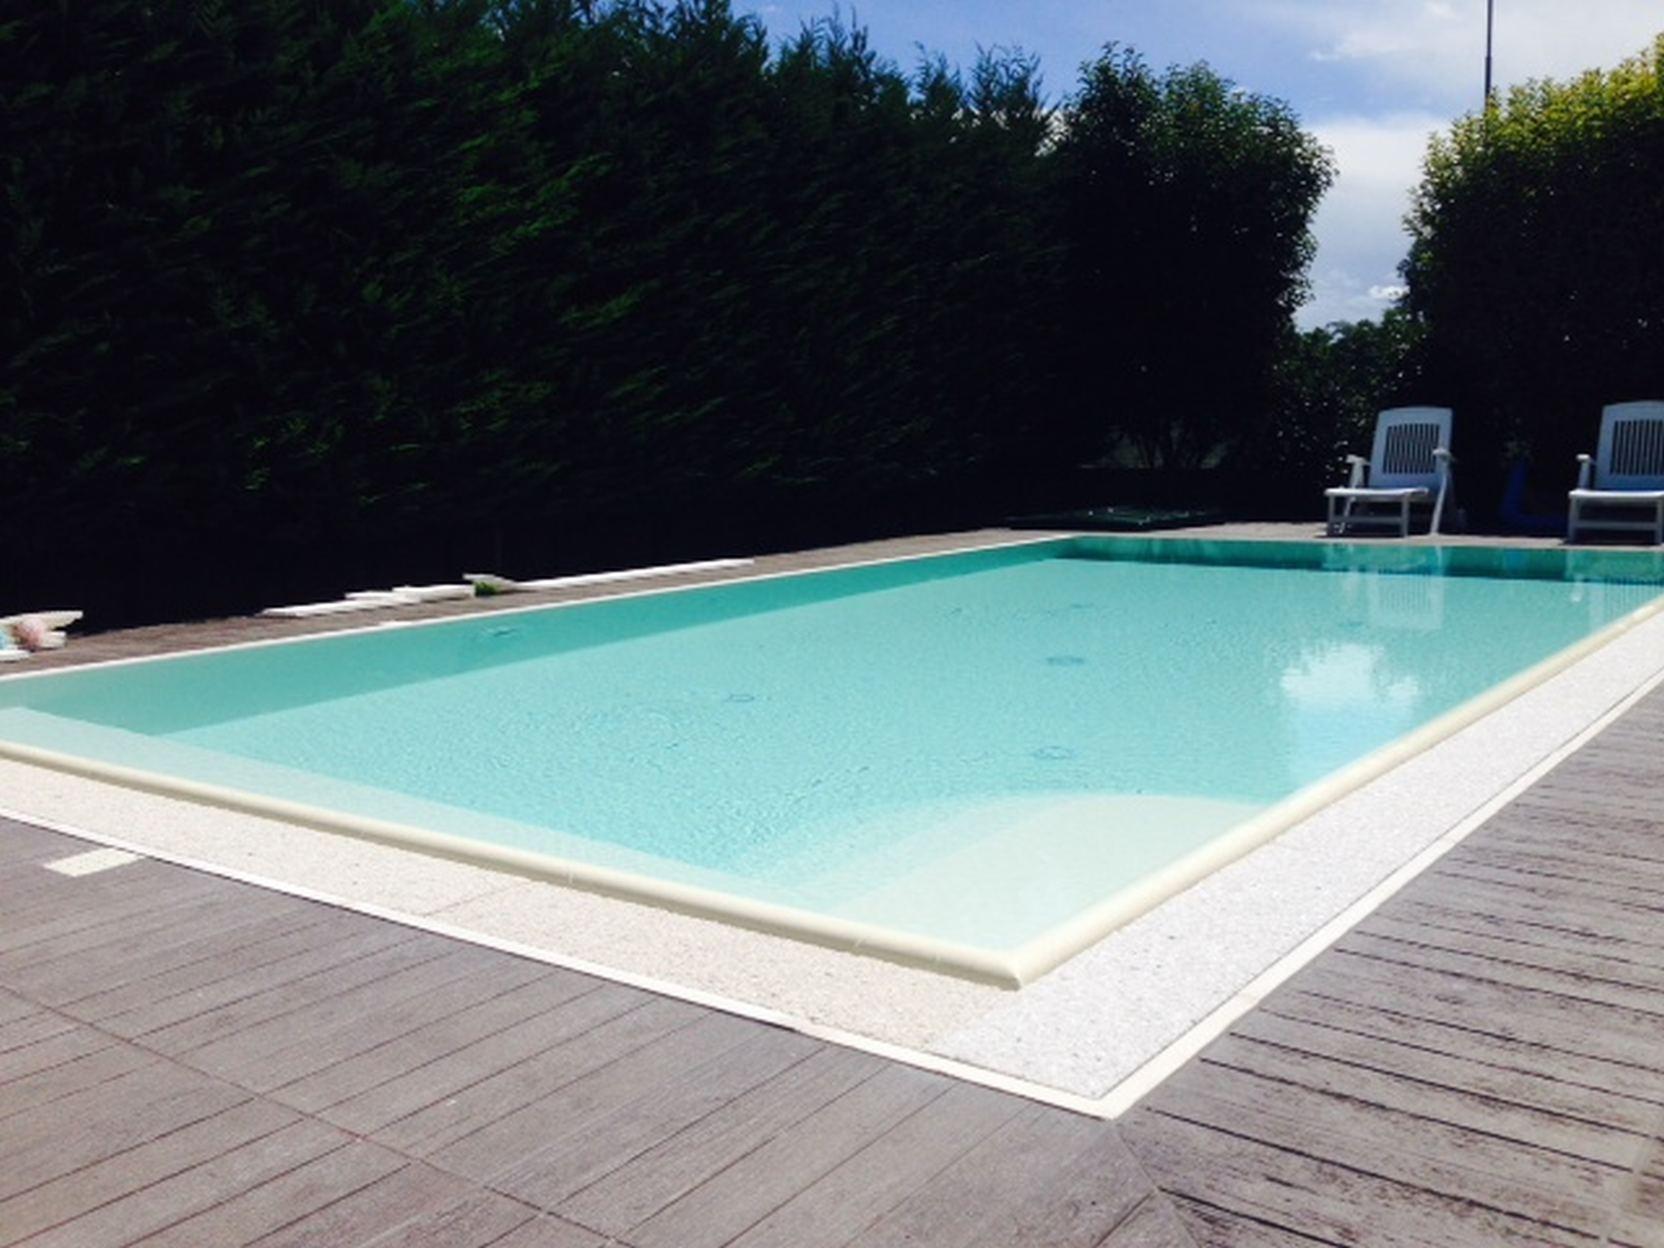 Levata 2 casareggio piscine piscine piscine mantova - Piscina mantova ...